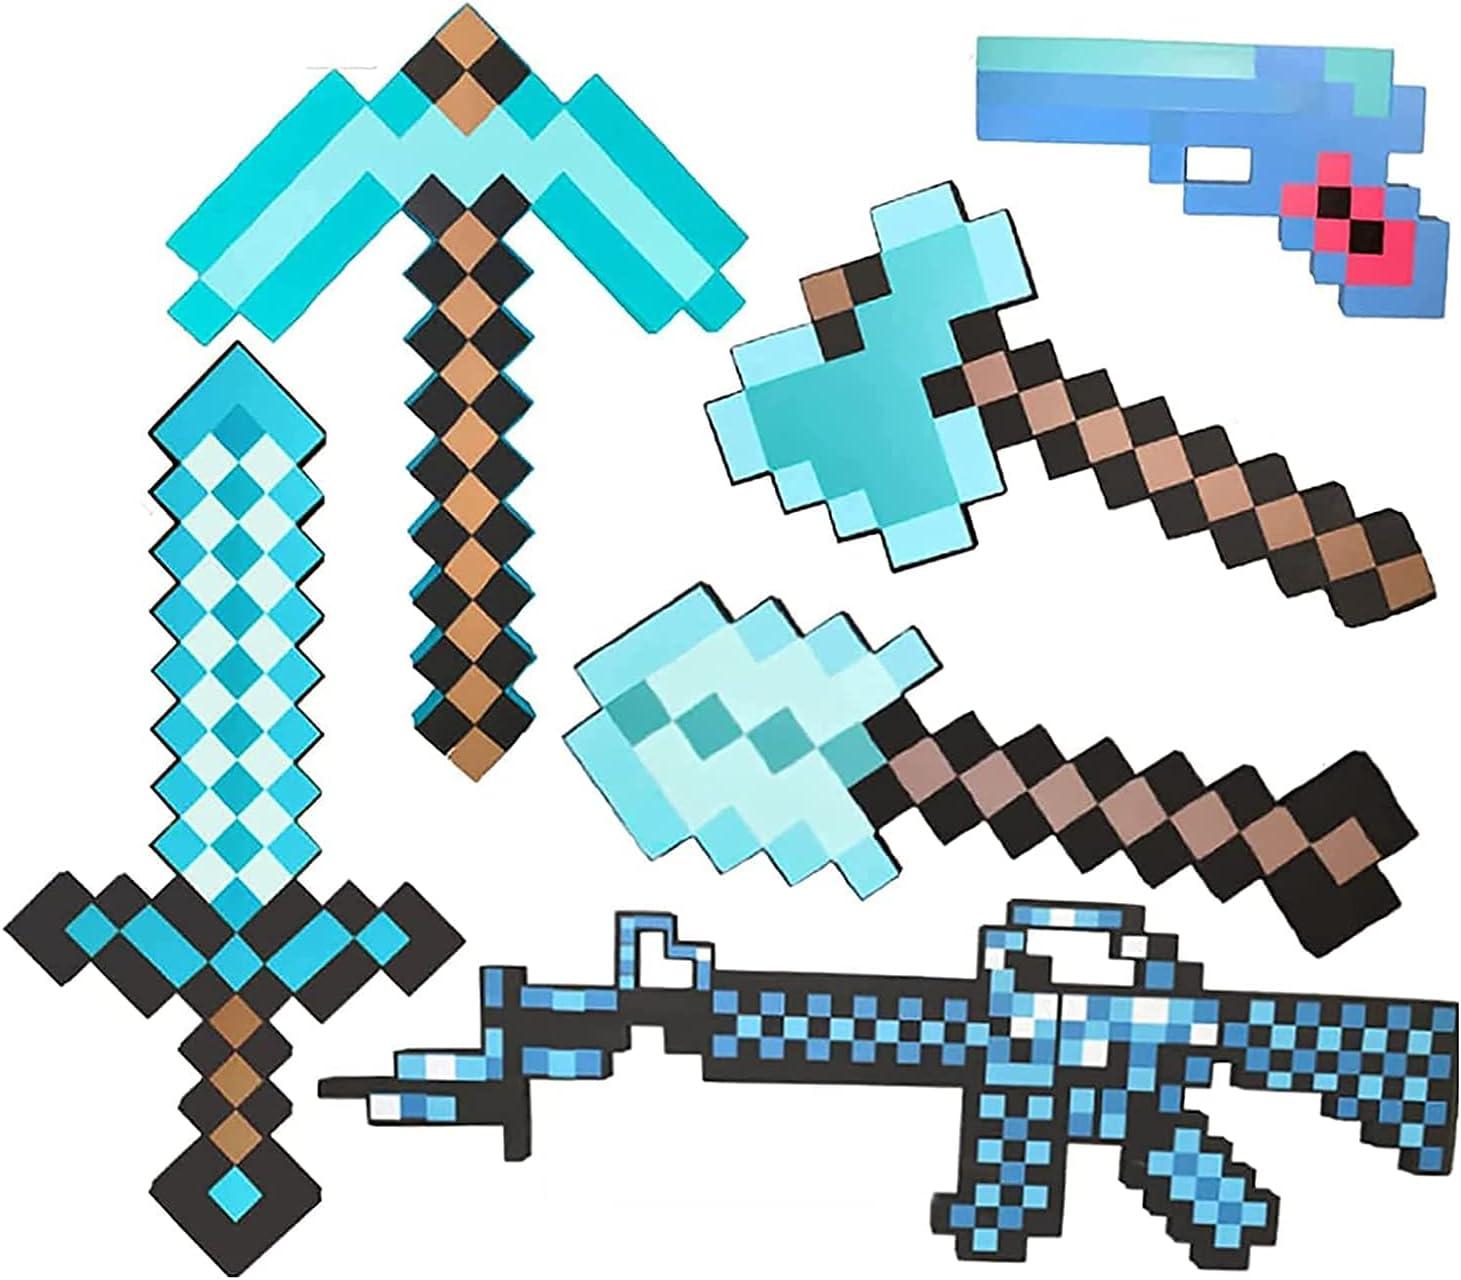 Shhjjyp Espada De Espuma para Niños Escudo Espada De Diamante Pico Pixel Axe Pala De Píxeles Subfusil Ametrallador Pistola De Píxeles Espada De Simulación Juguetes para Niños 8 Combinaciones,A